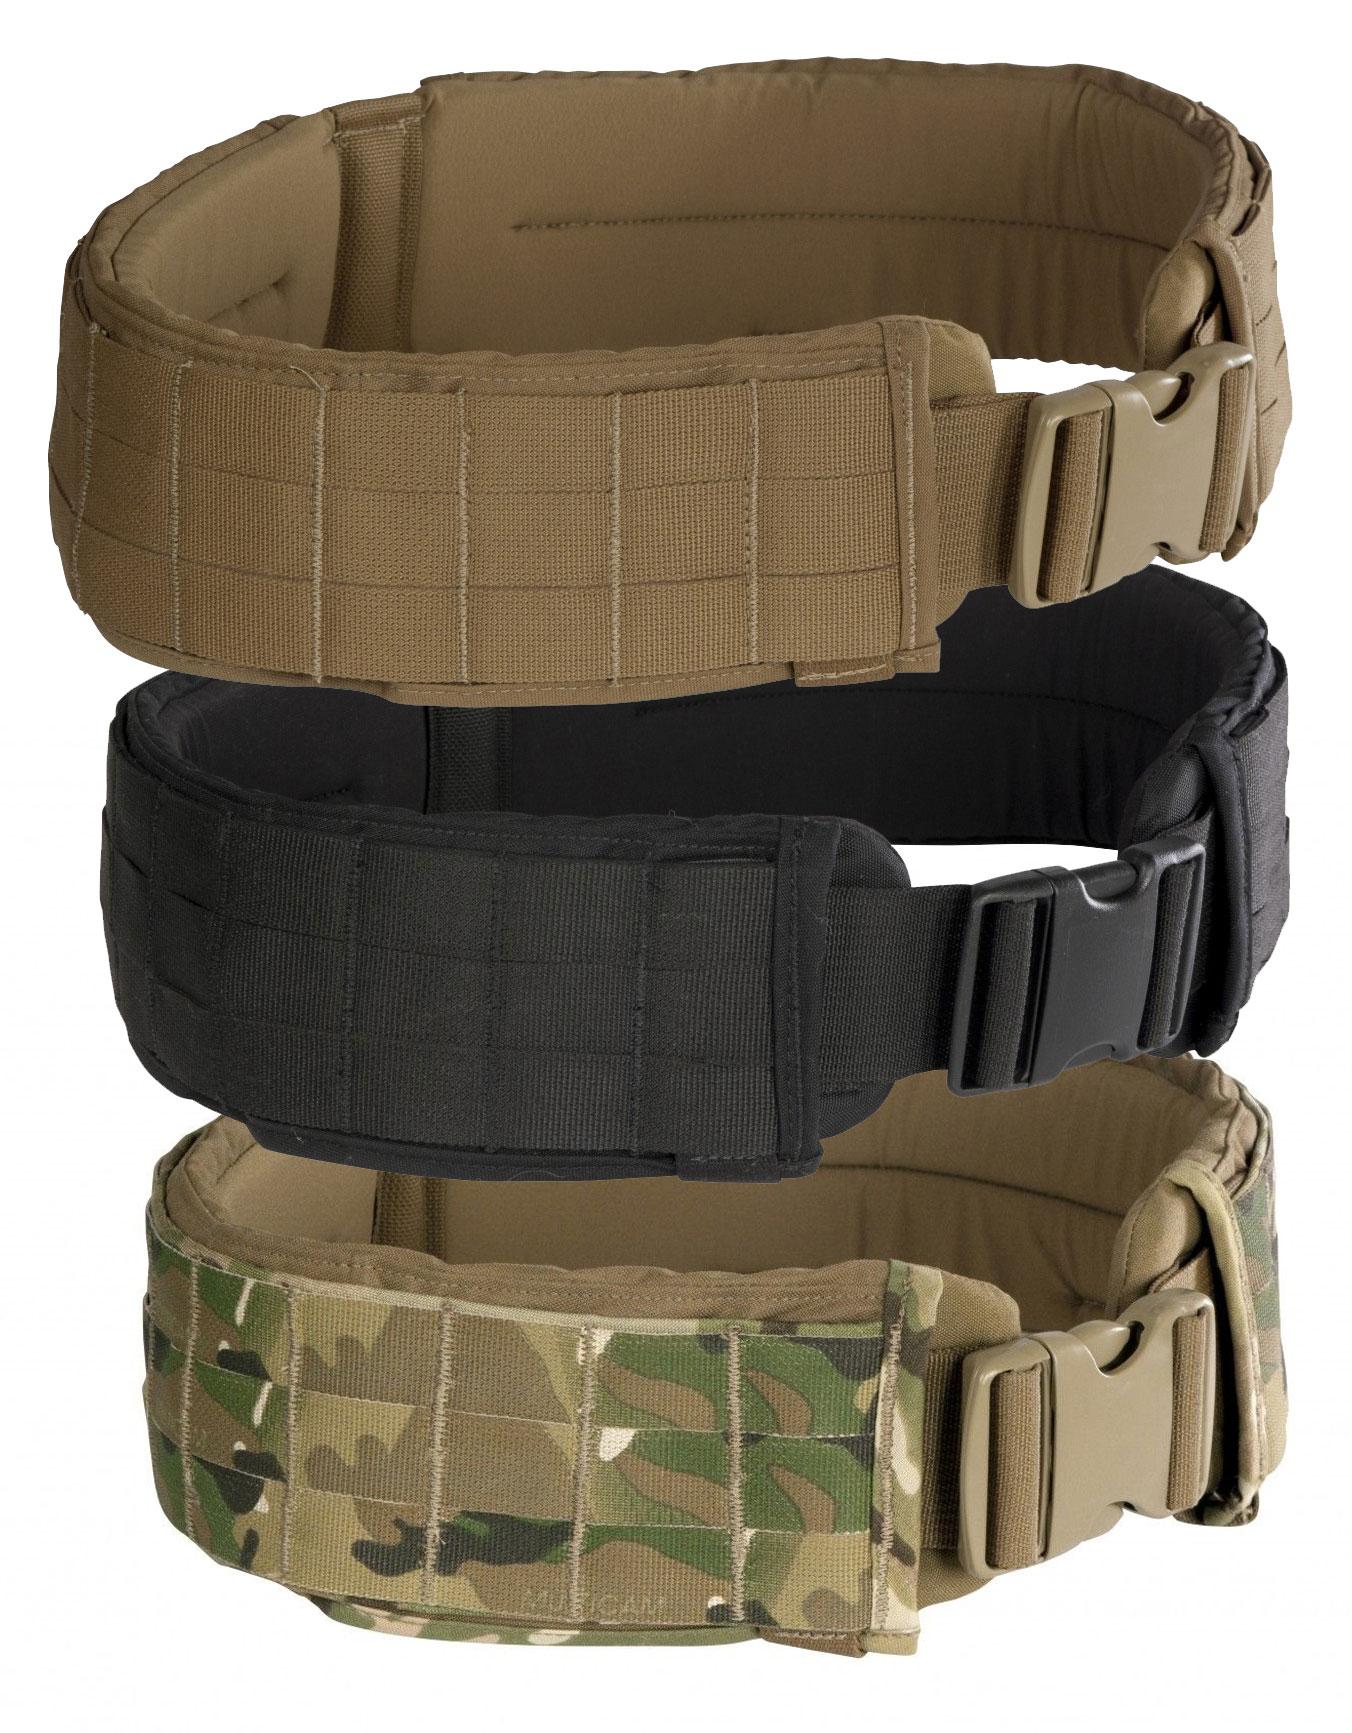 Granite Tactical Gear Padded Patrol Belt Ebay